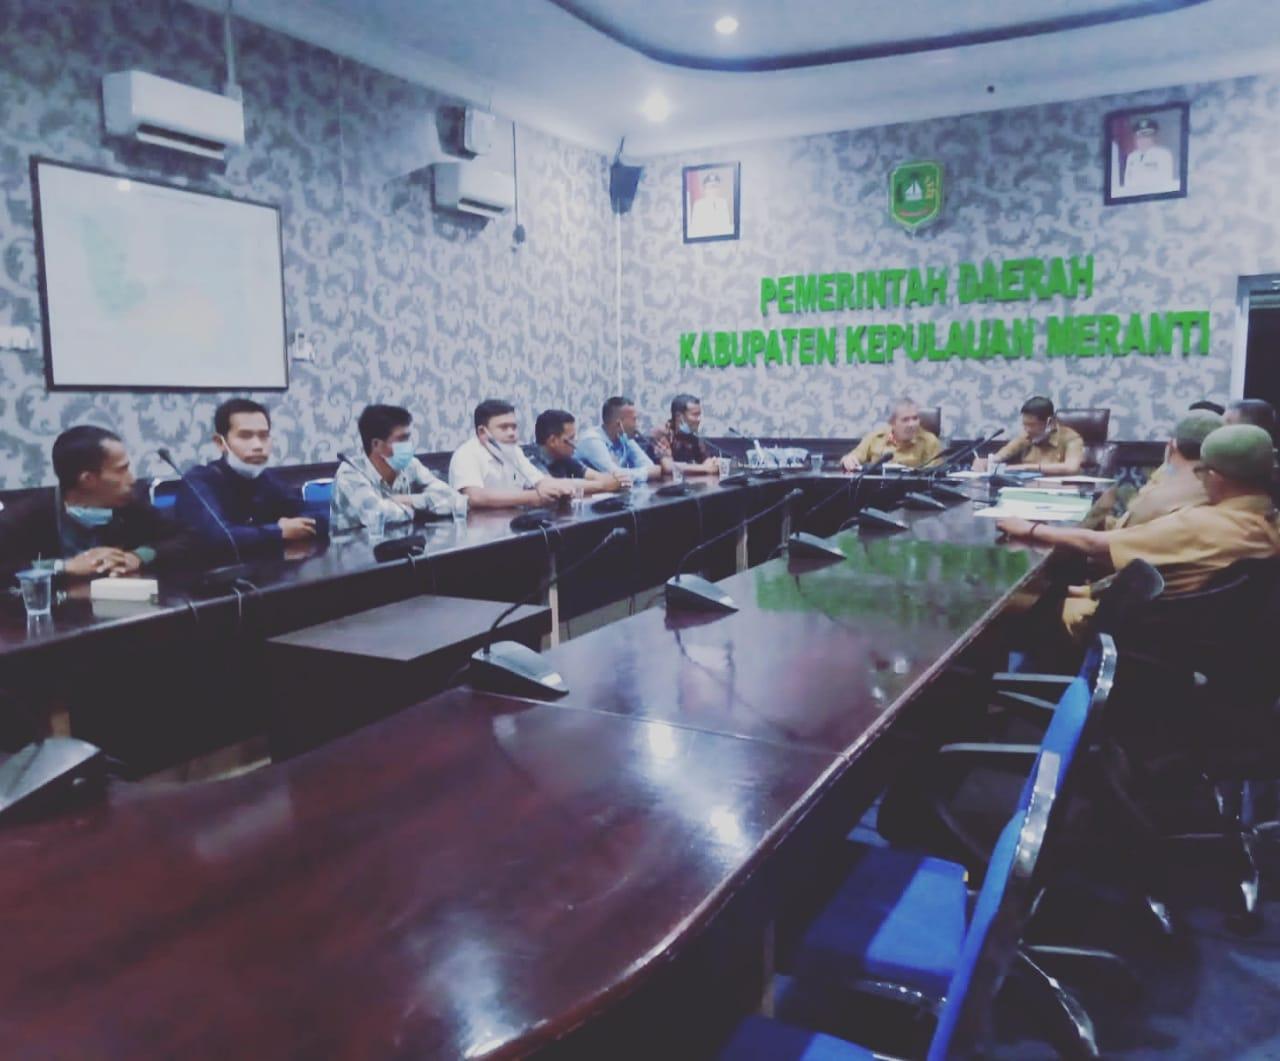 Foto Laskar Muda Melayu Riau (LM2R) bersama bakal calon baik dari desa Banglas kecamatan tebing tinggi maupun Desa Renak dungun Kecamatan Pulau Merbau saat Audensi kepada Sekda Kabupaten Kepulauan Meranti.